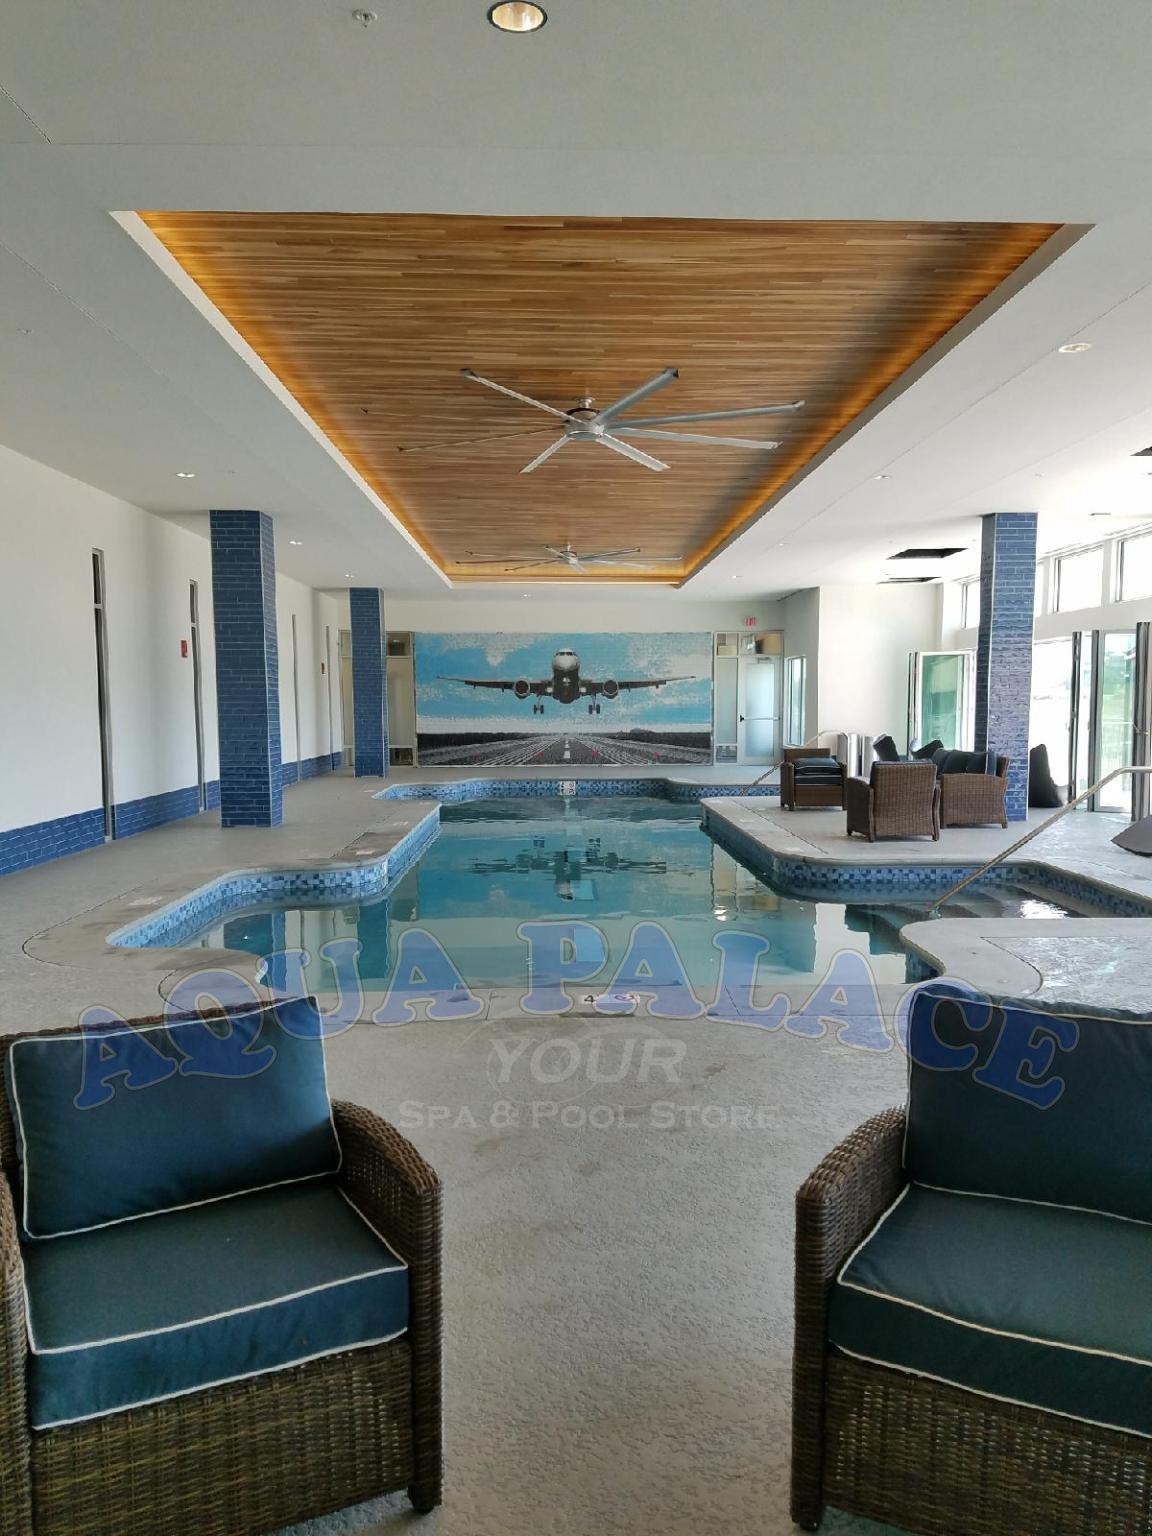 Atlas Apartments In Downtown Omaha Ne Shotcrete Pool On 1st Floor With Airplane Landing Strip Centered In Bottom Of Pool Mat Pool Pool Designs Pool Builders